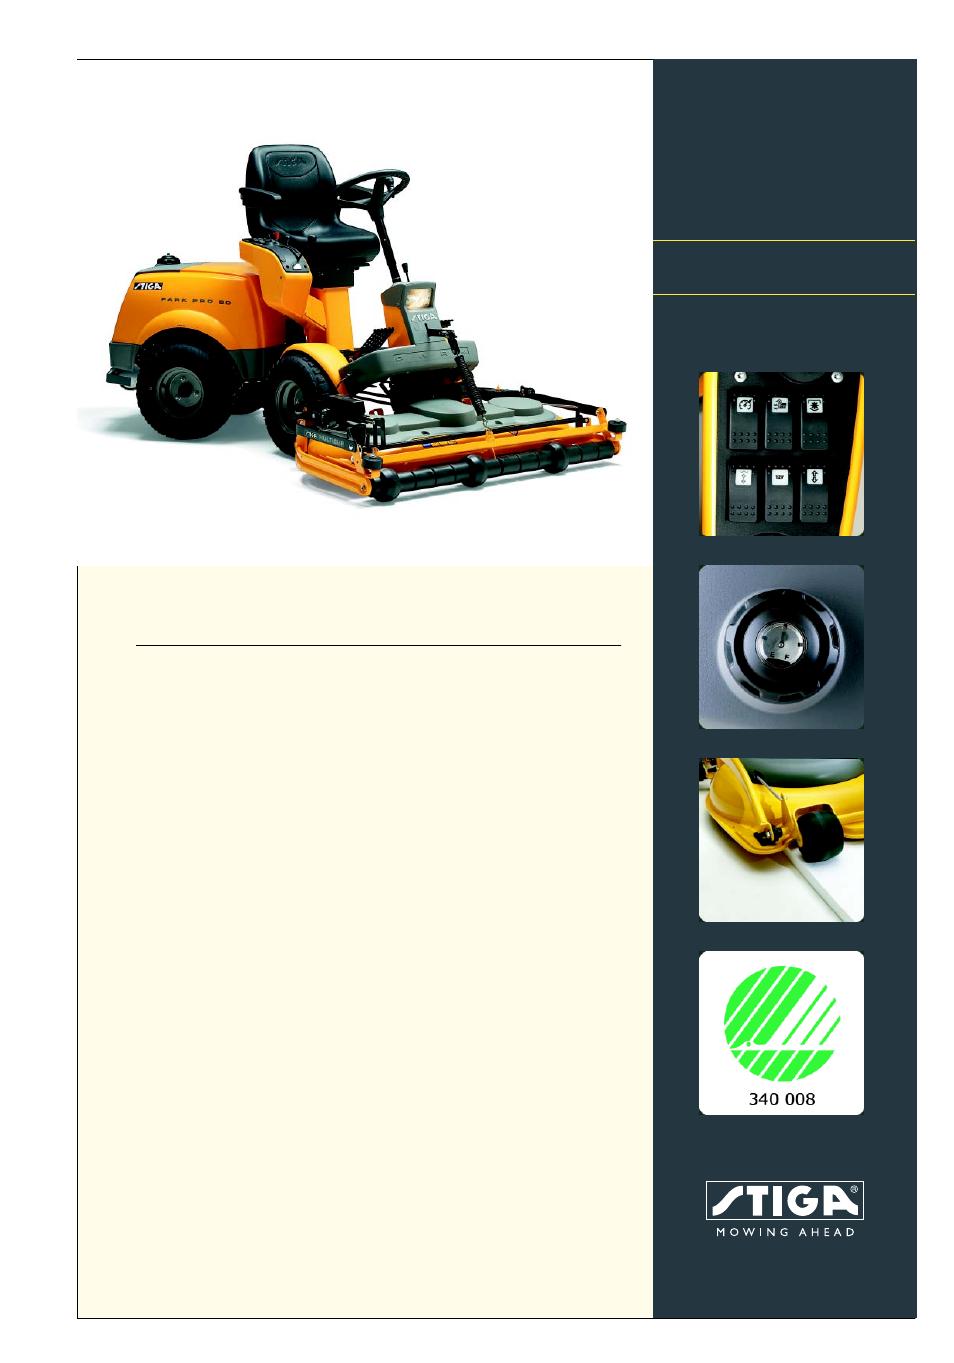 stiga park pro 20 cat user manual 2 pages rh manualsdir com Craftsman Lawn Mower Manual Manual Push Lawn Mowers